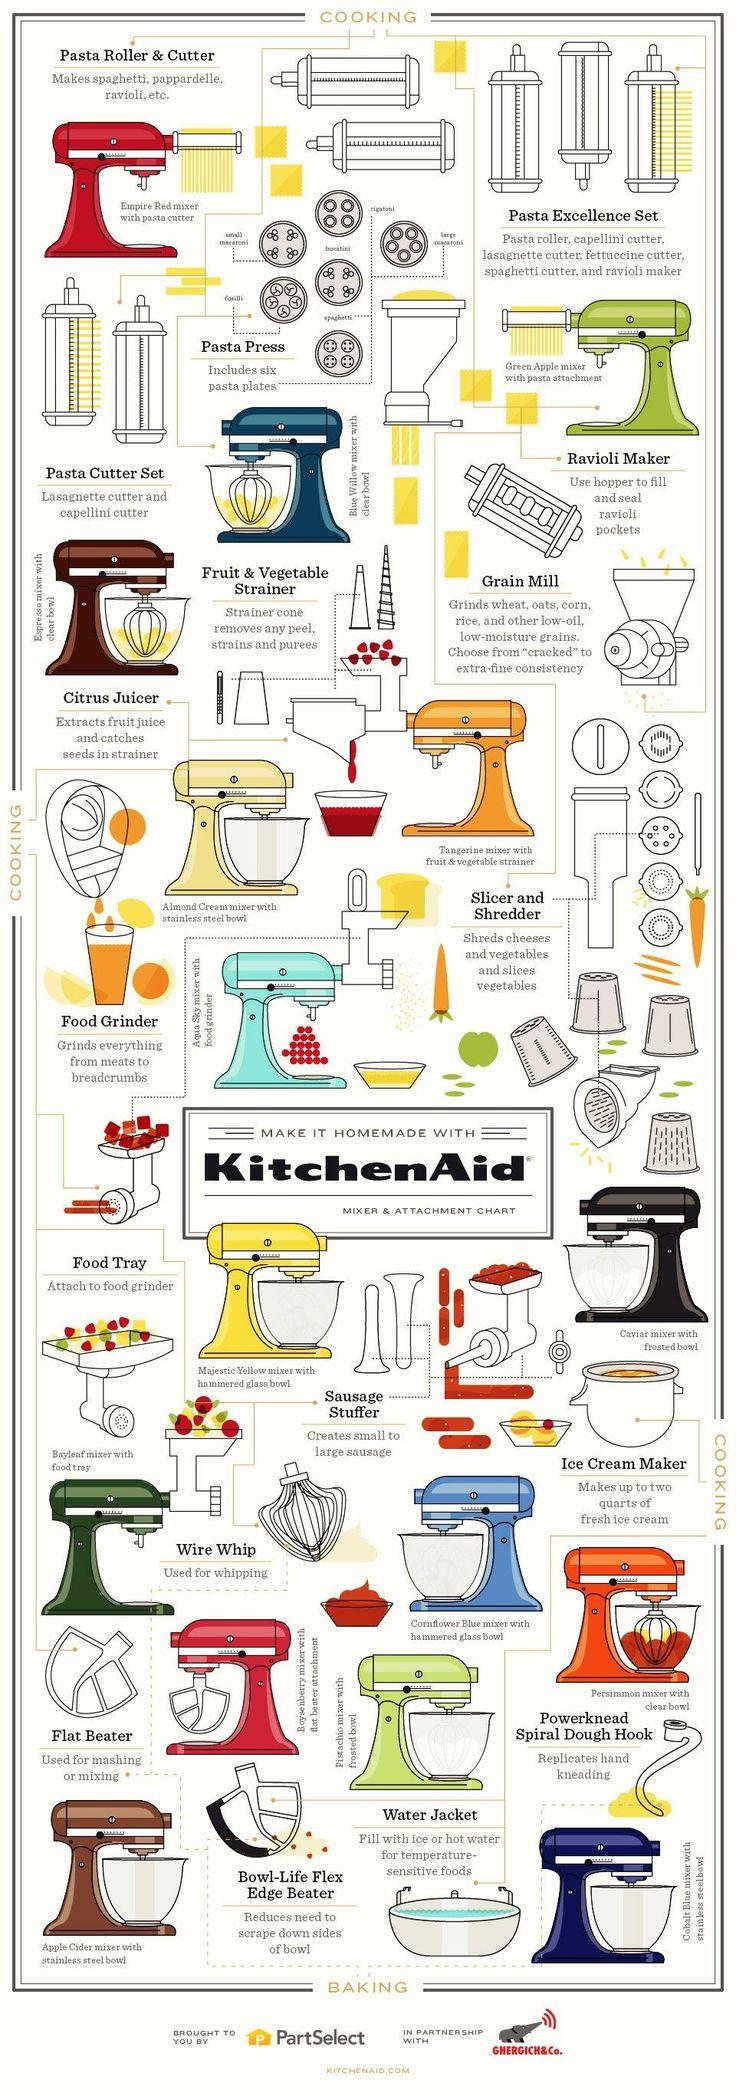 Every KitchenAid mixer attachment and its kitchen use via Imgur.